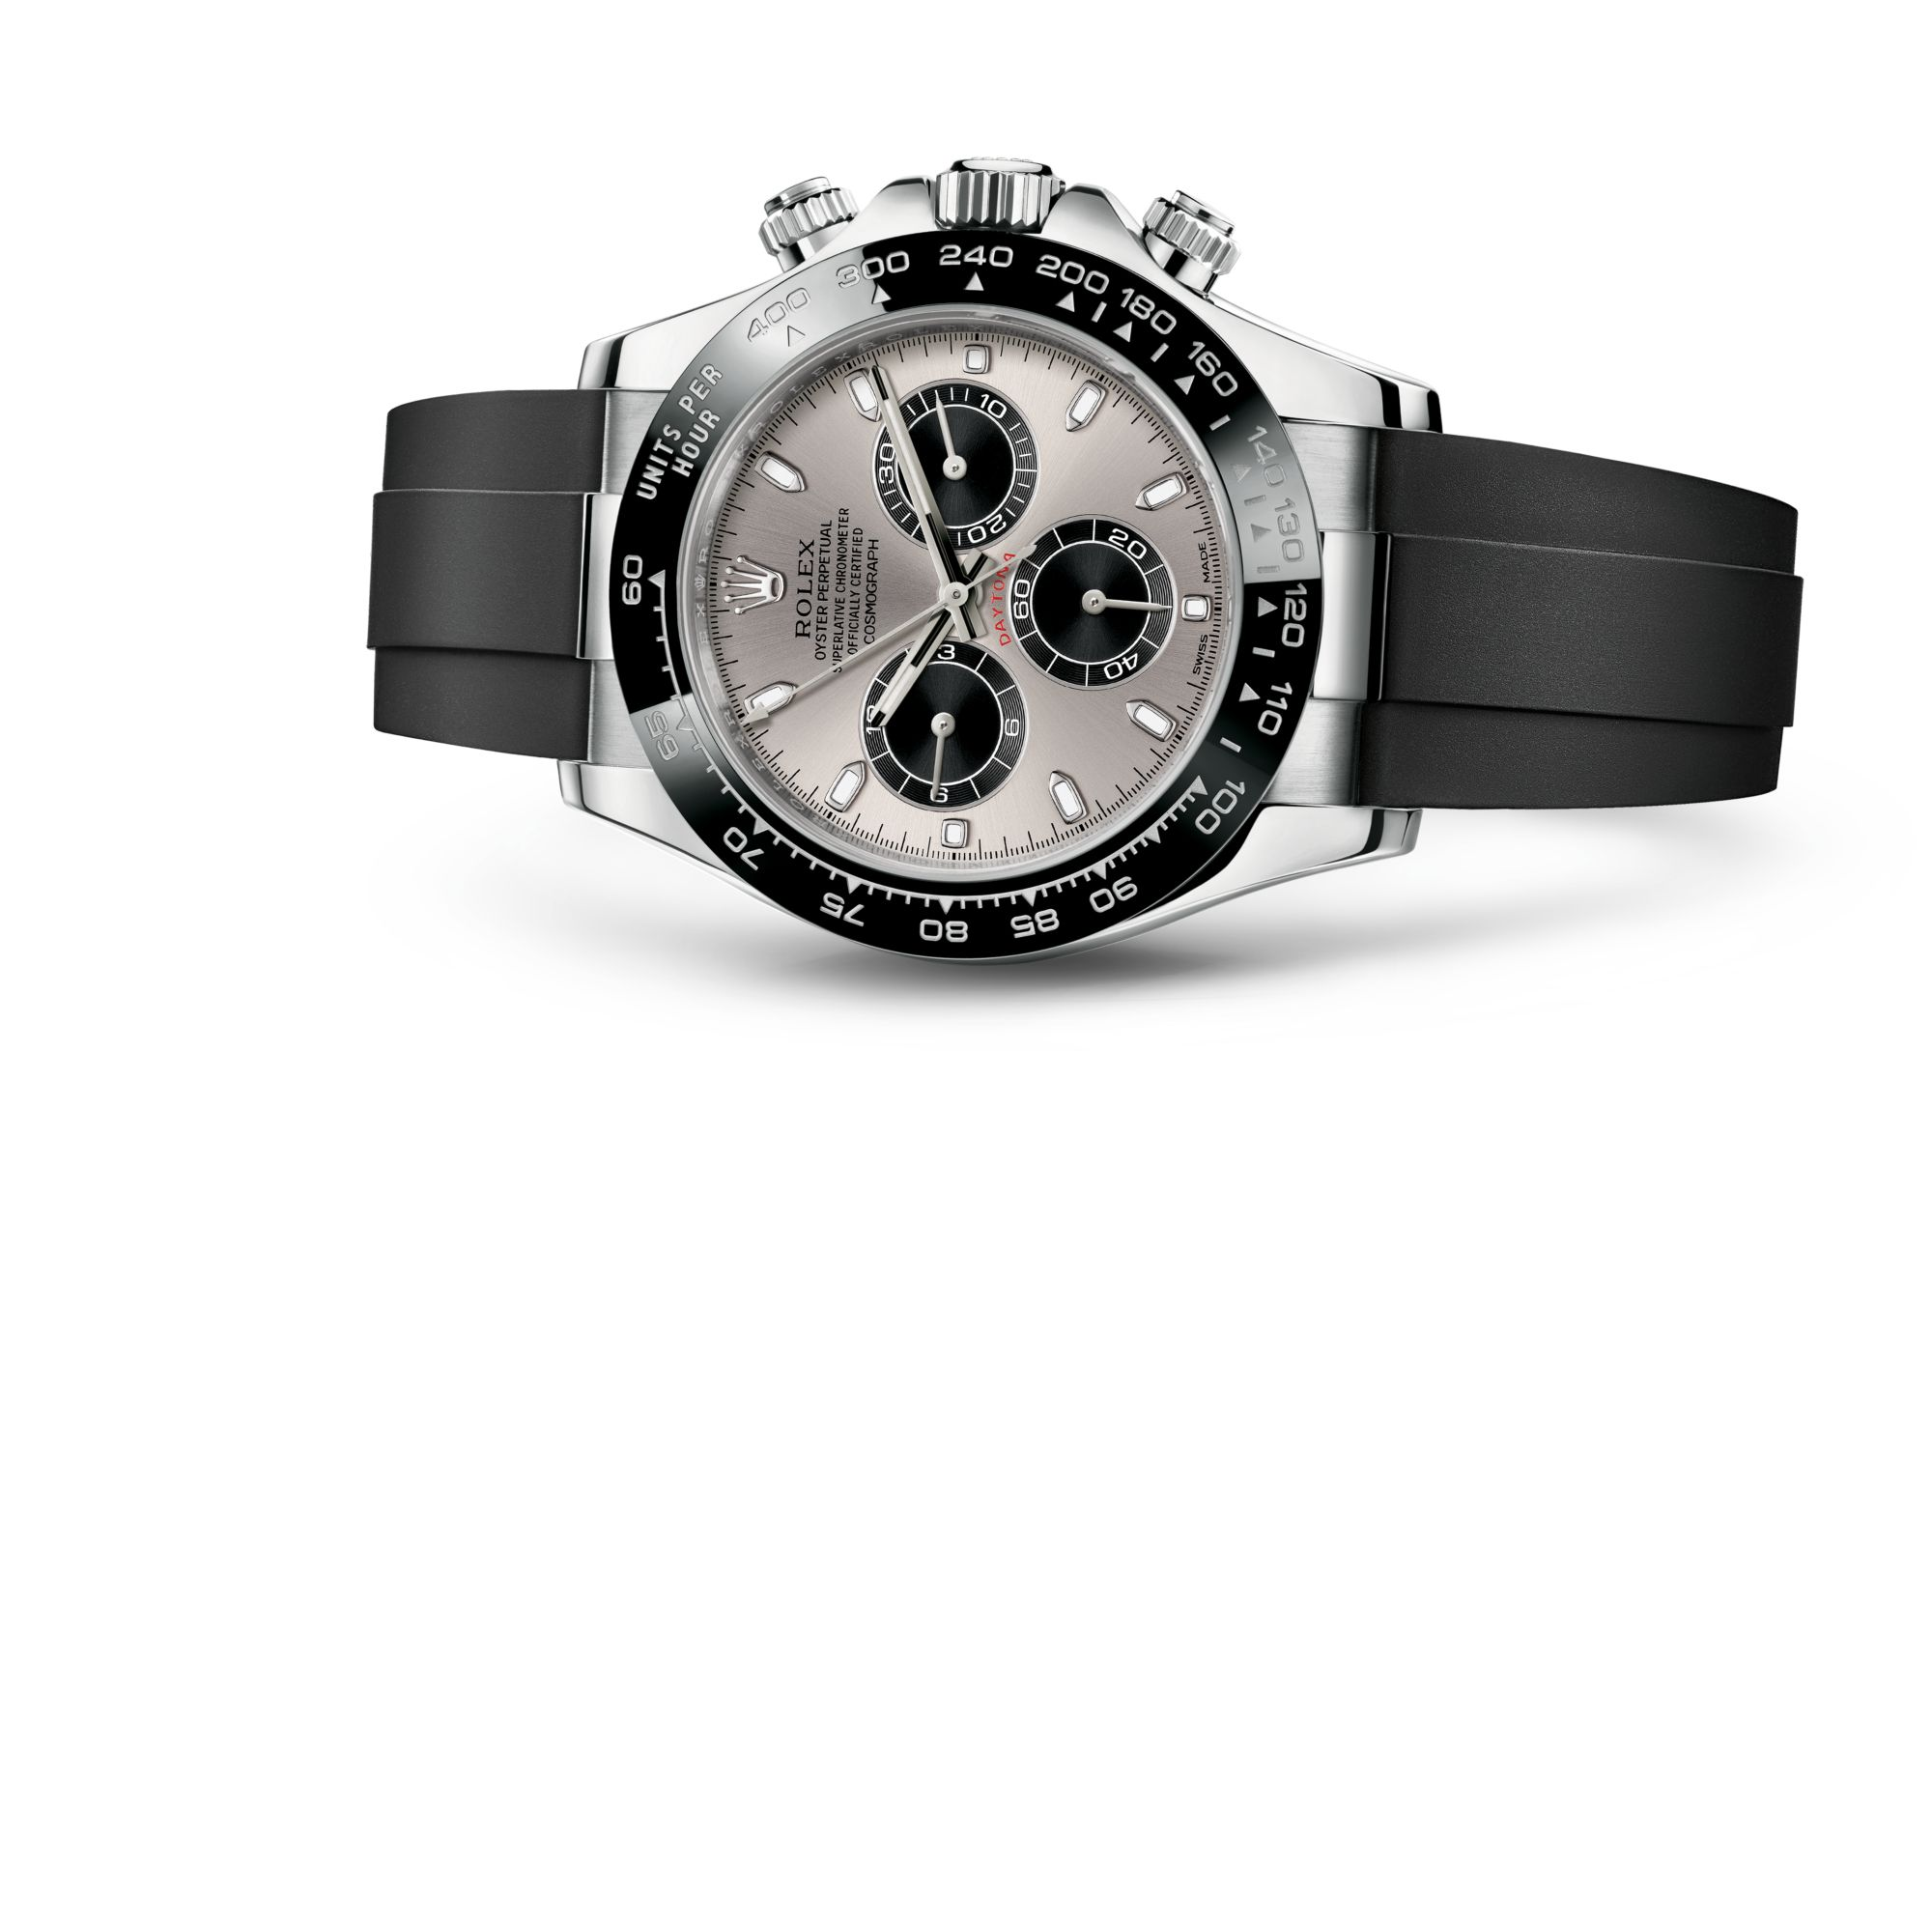 Rolex كوزموغراف دايتونا M116519LN-0024